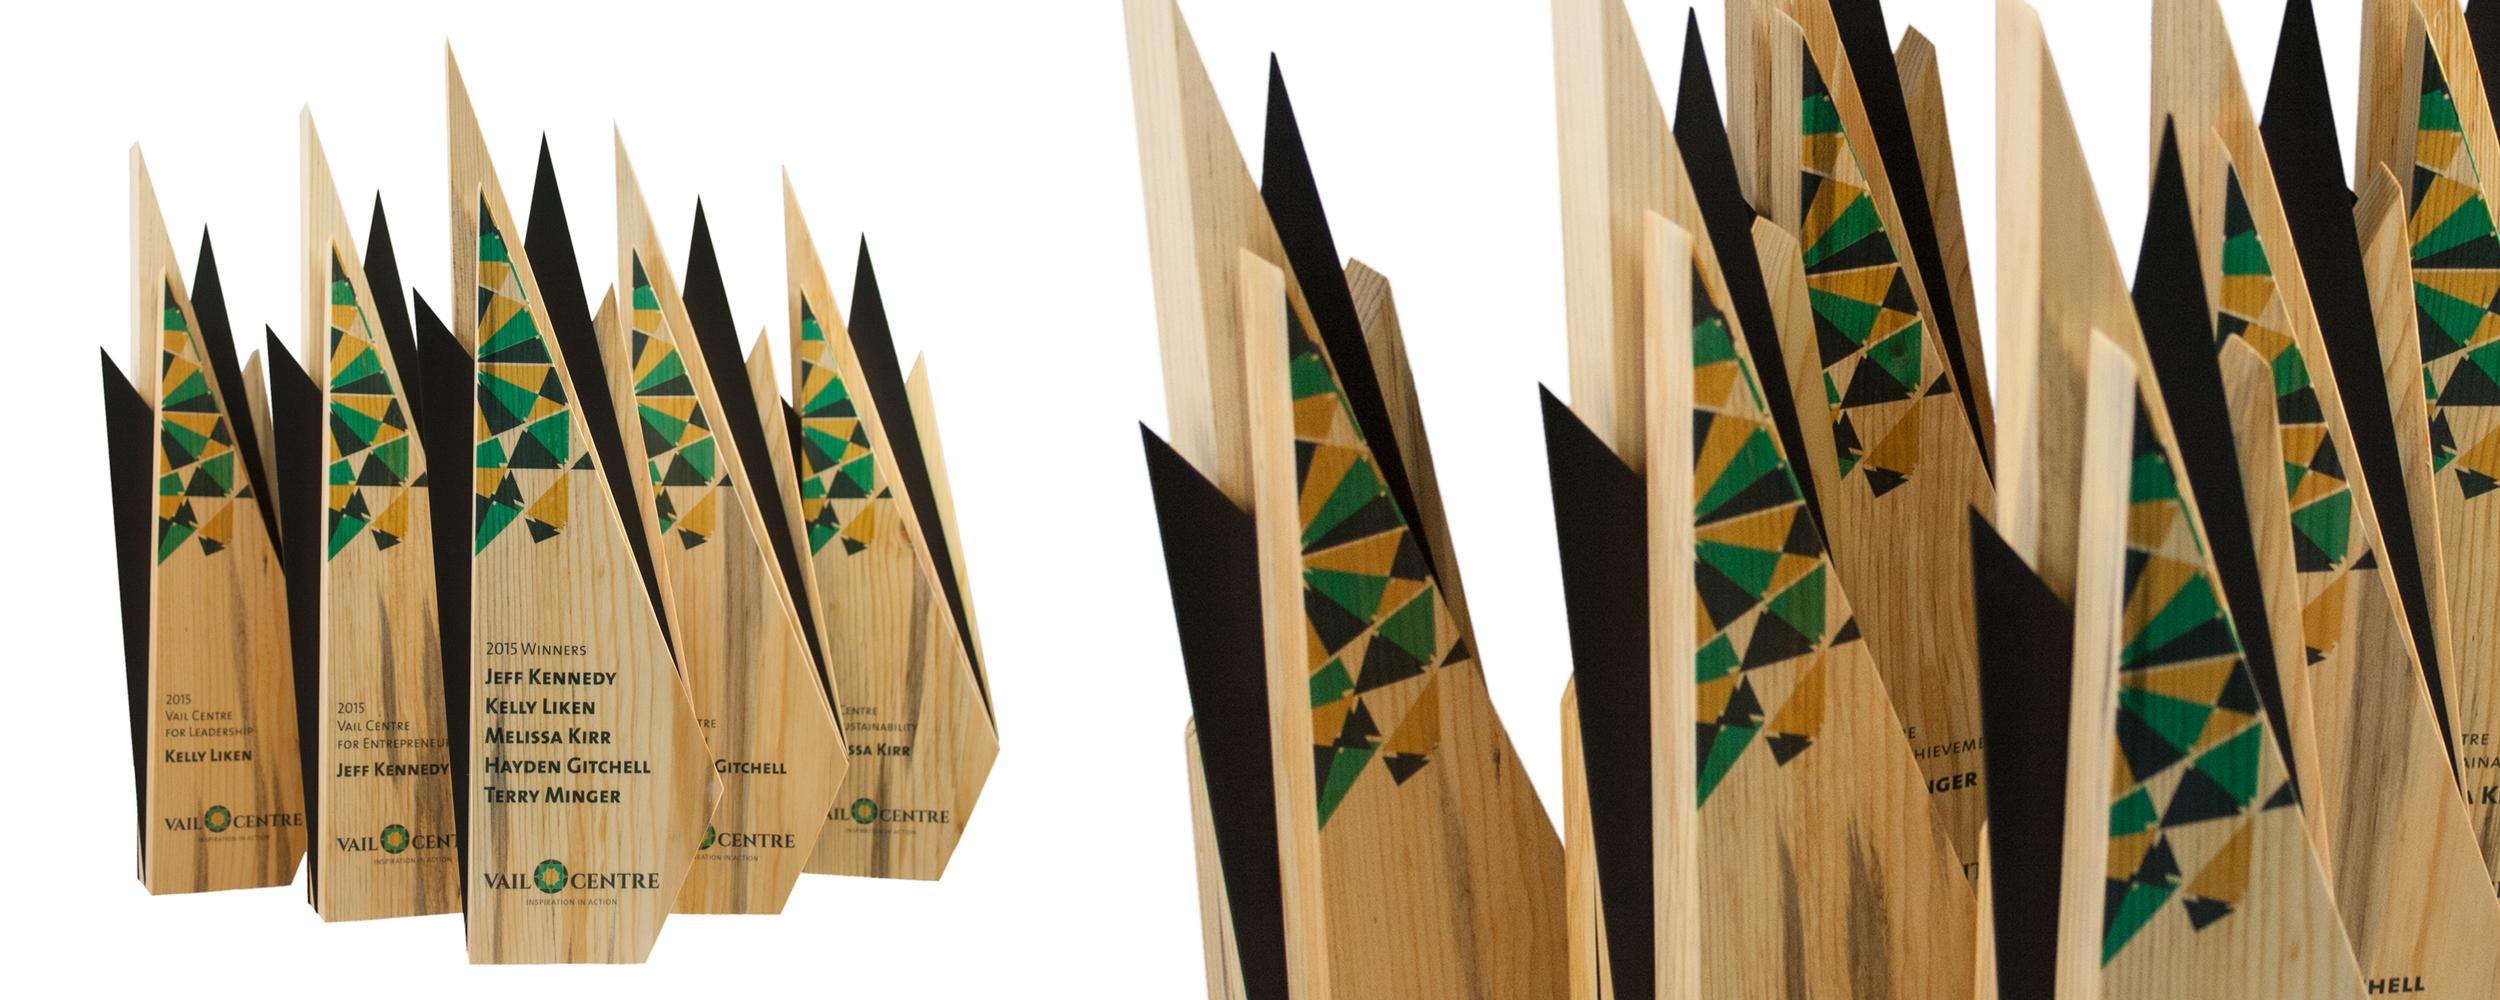 eco friendly recovered wood awards - vail centre colorado usa